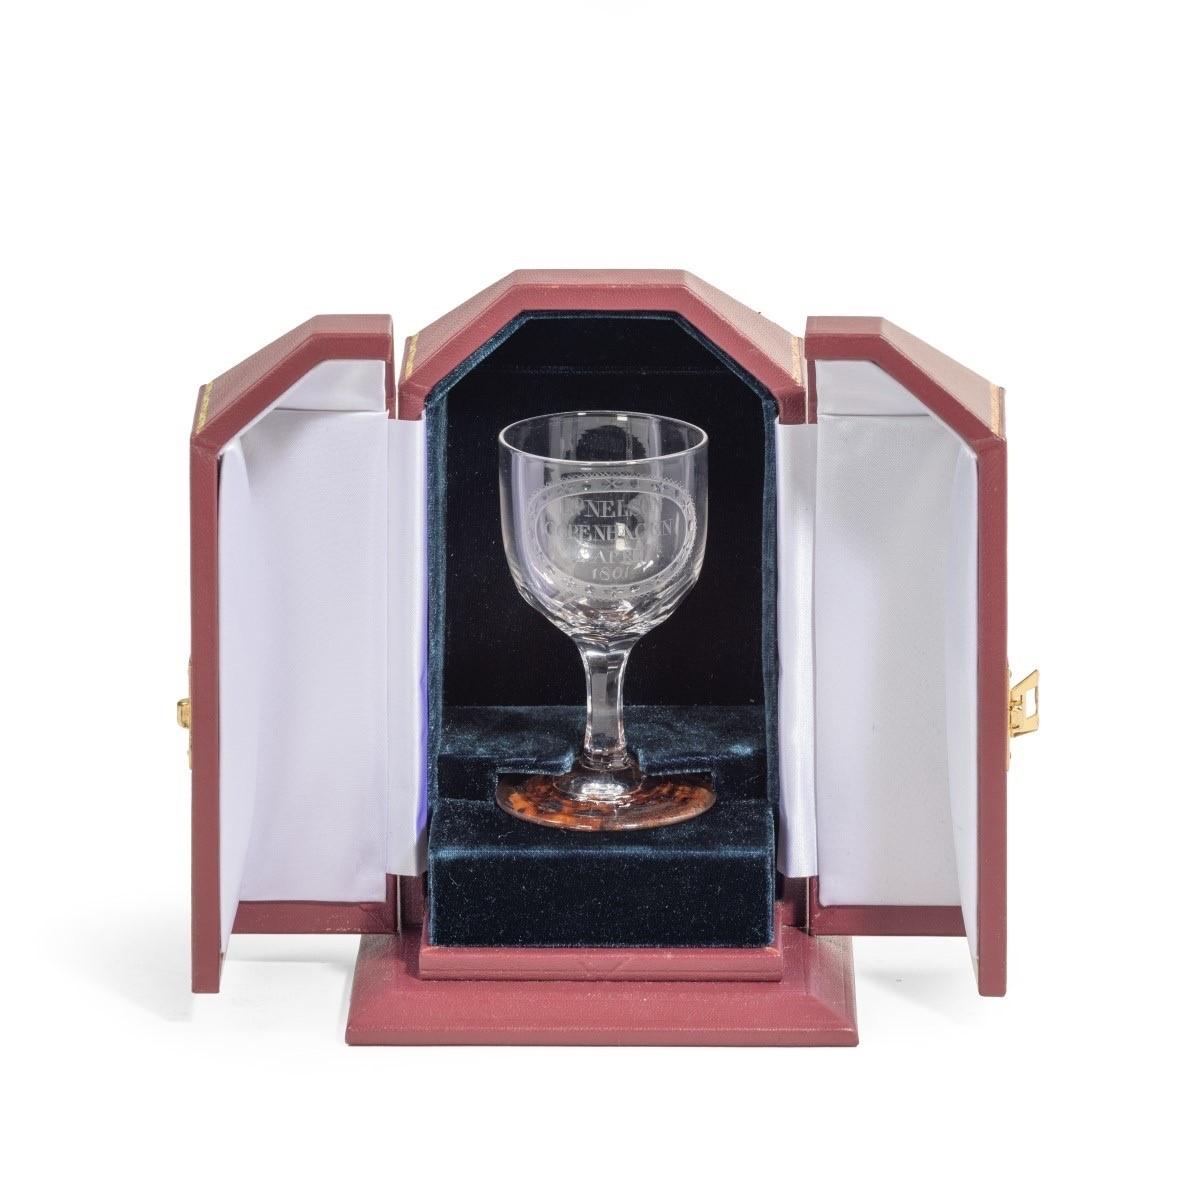 Admiral Viscount Nelson's wine glass commemorating the Battle of Copenhagen